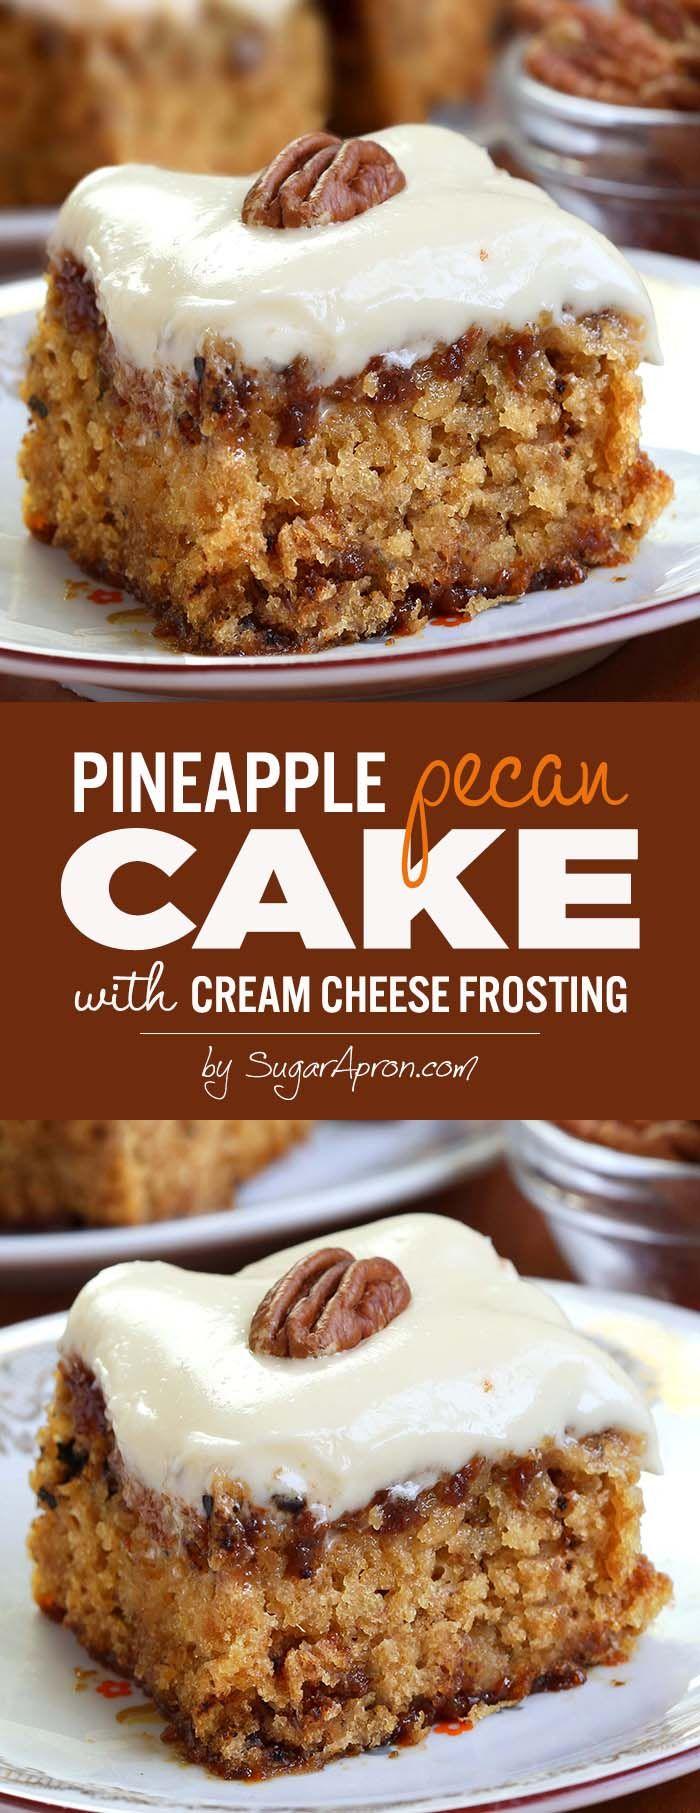 Pineapple Pecan Cake - Sugar Apron